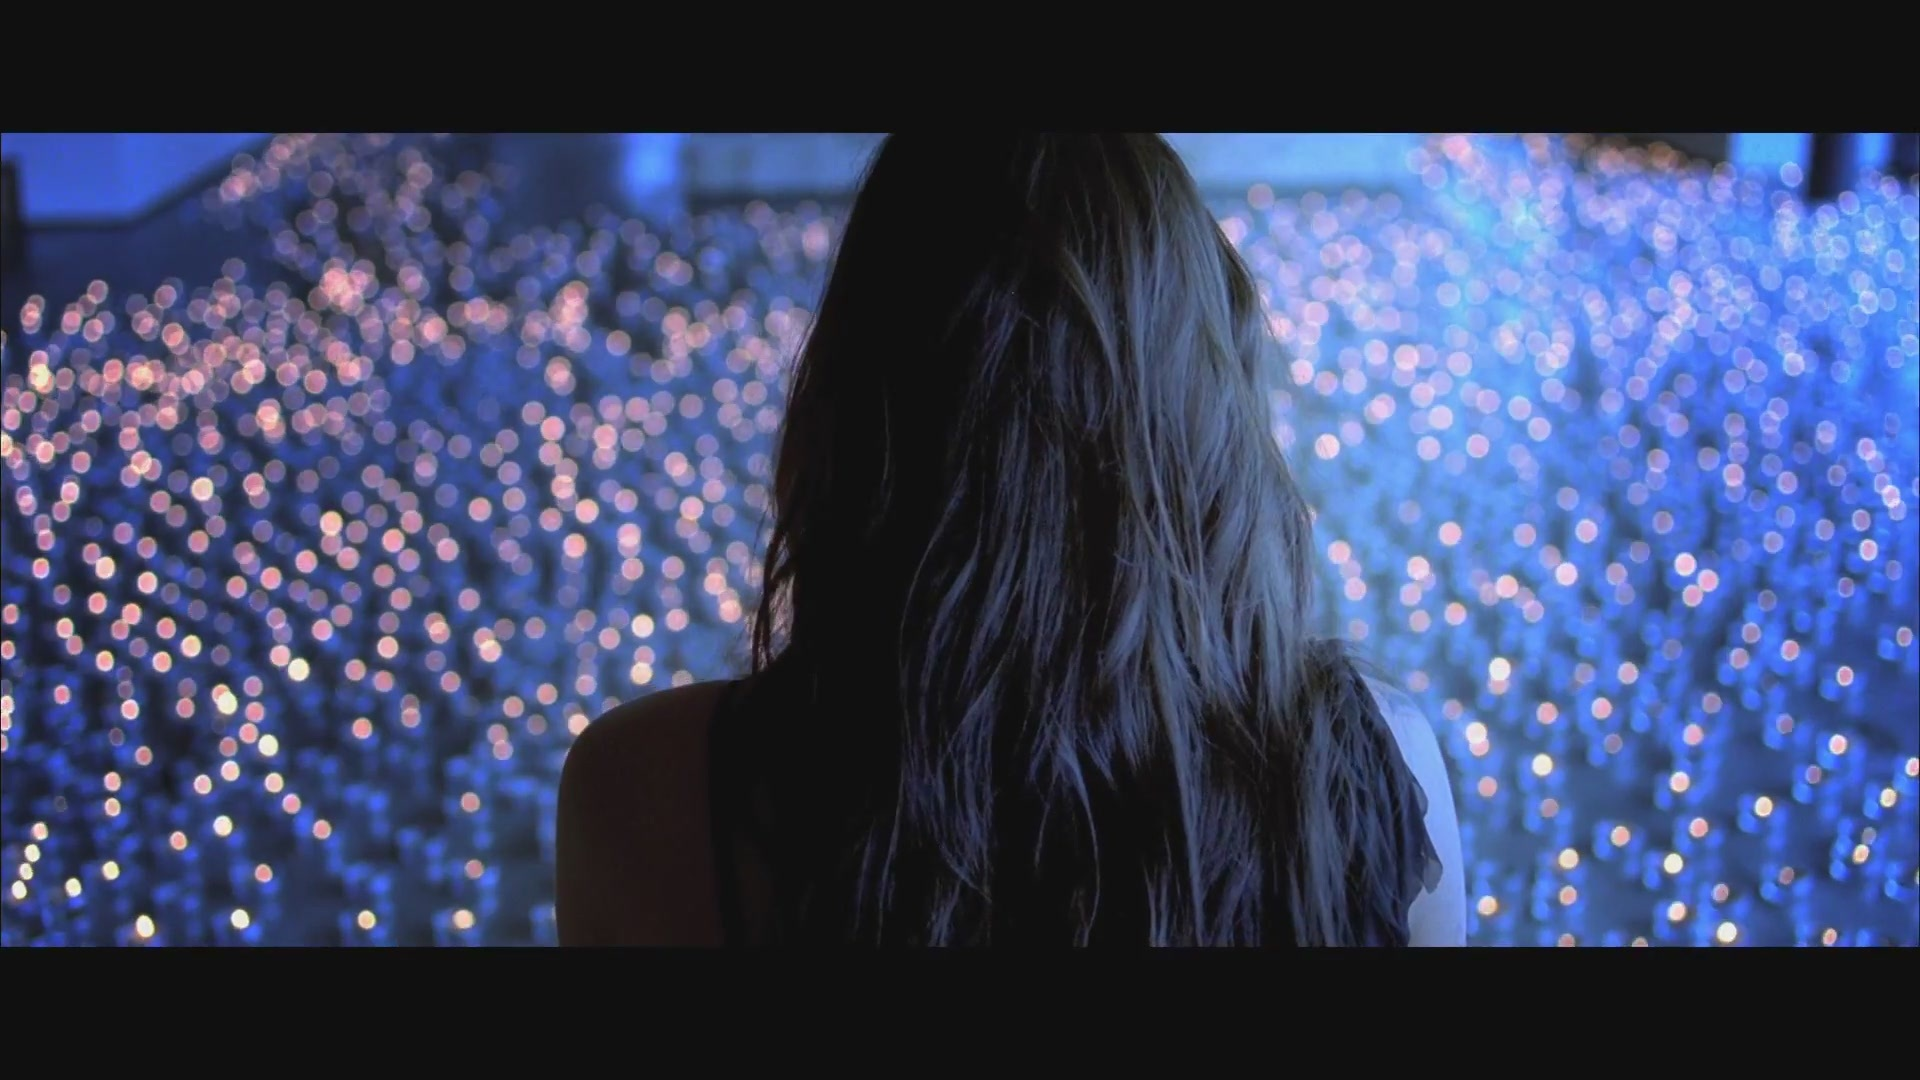 A Thousand Years - Christina Perri Image (26451324) - Fanpop